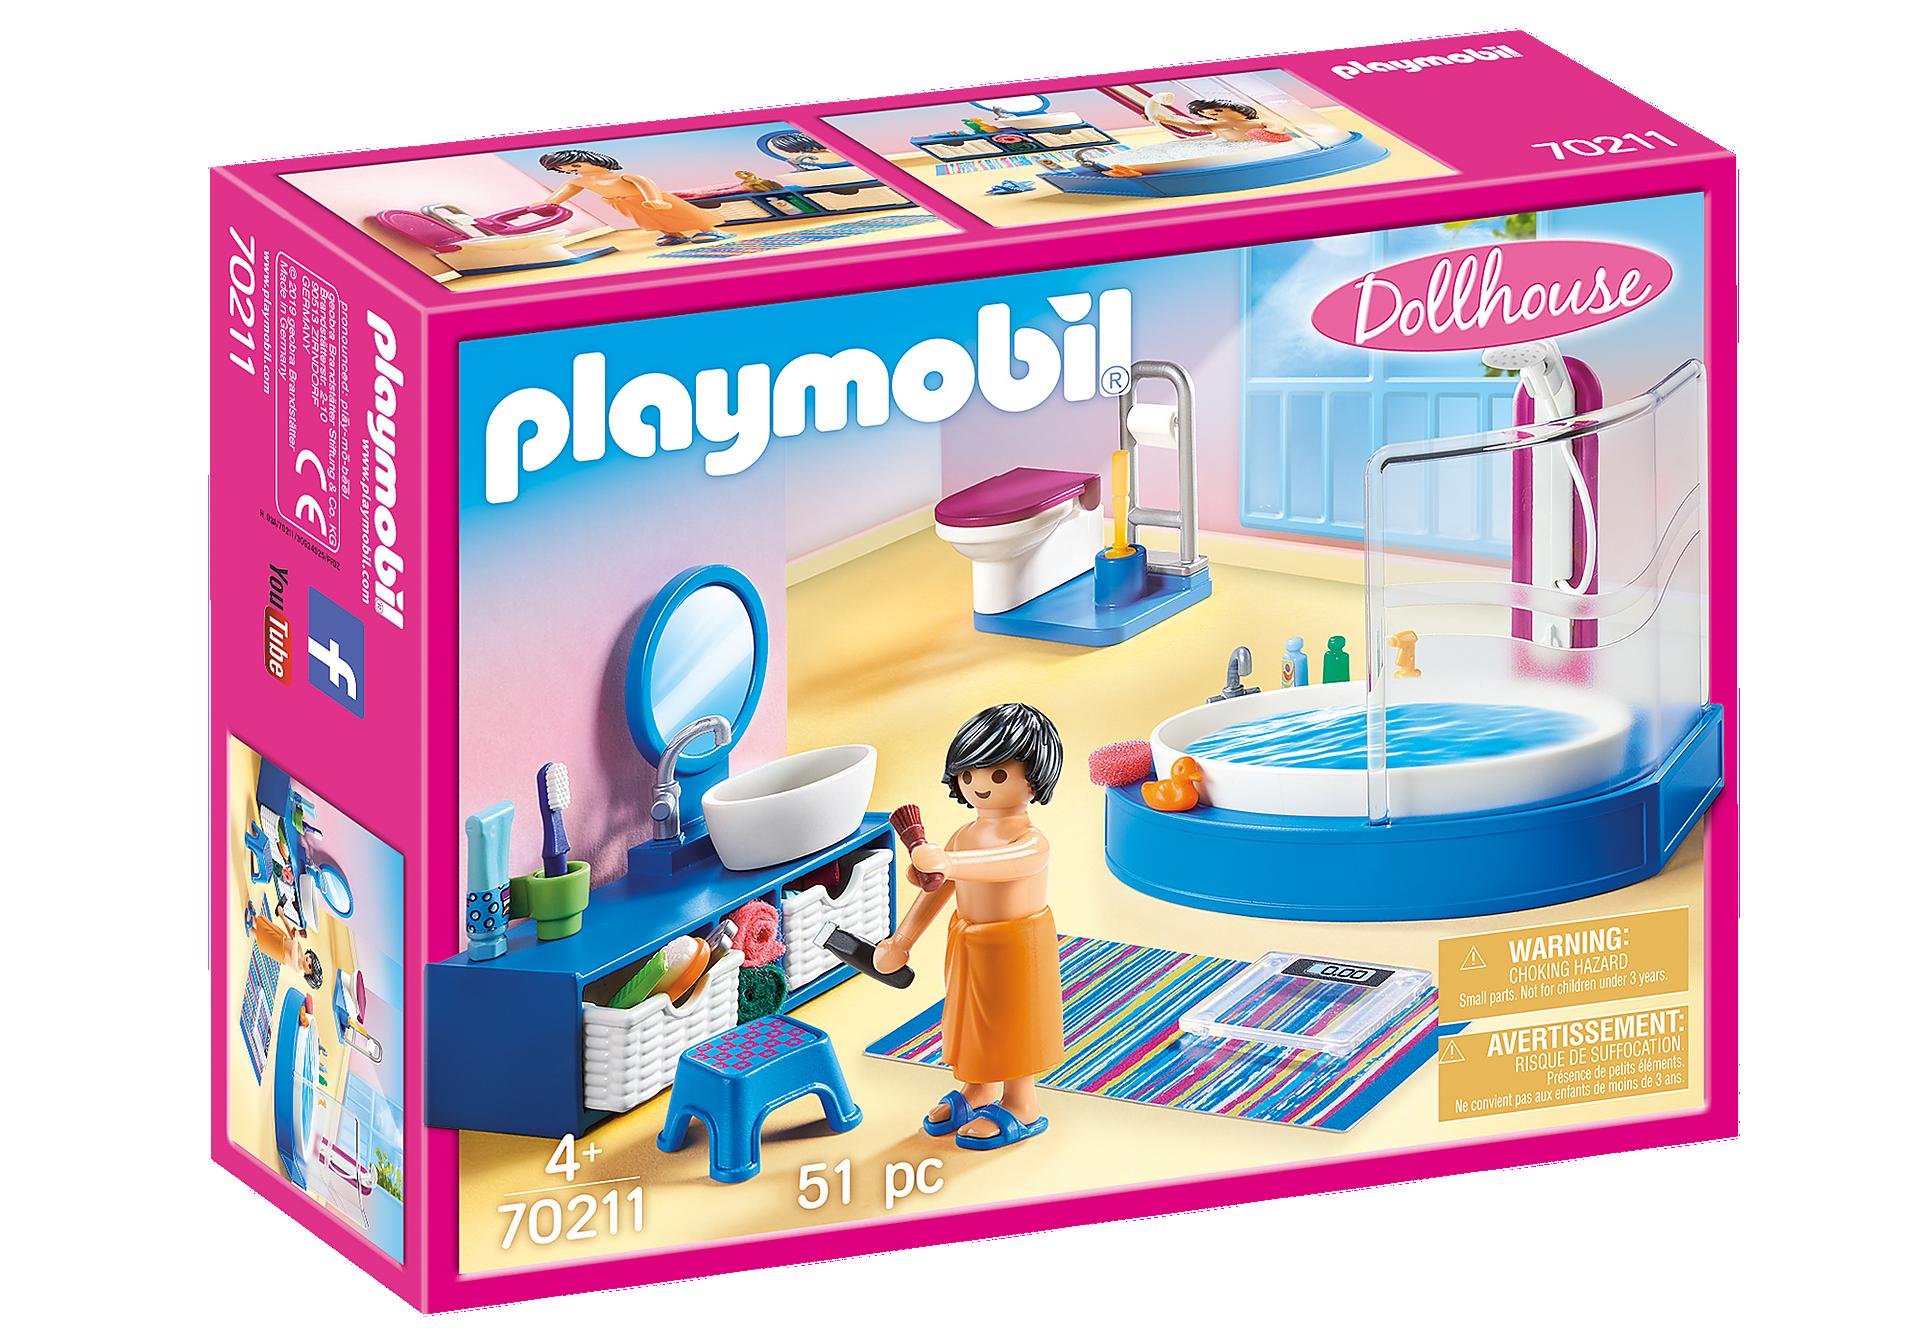 Playmobil - Bathroom with Tub (70211)